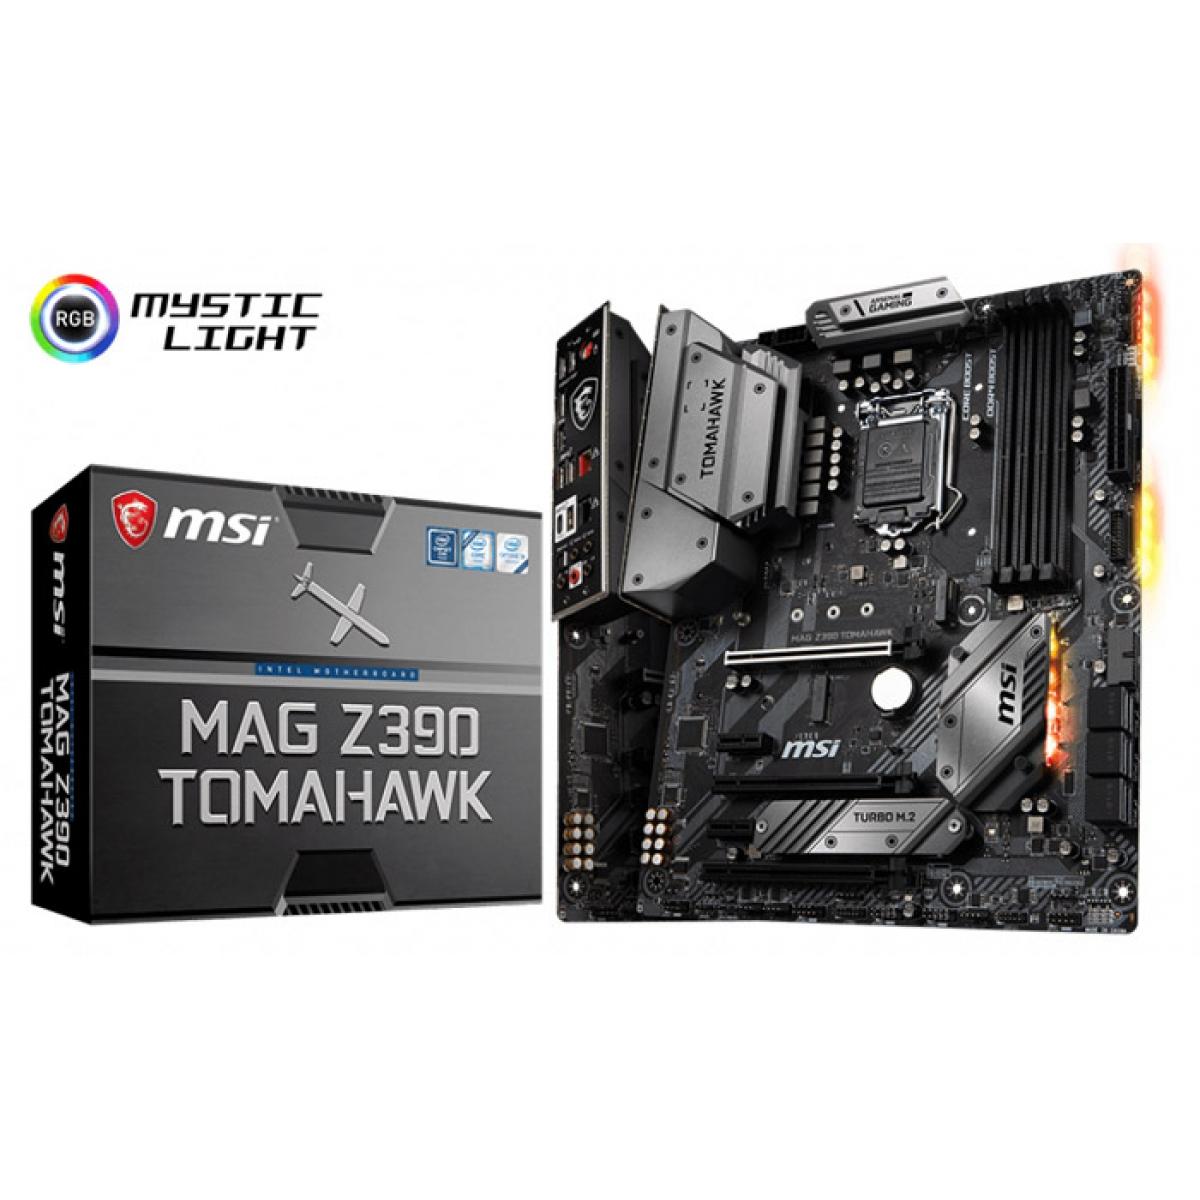 Placa Mãe MSI Z390 Mag Tomahawk, Chipset Z390, Intel LGA 1151, ATX, DDR4